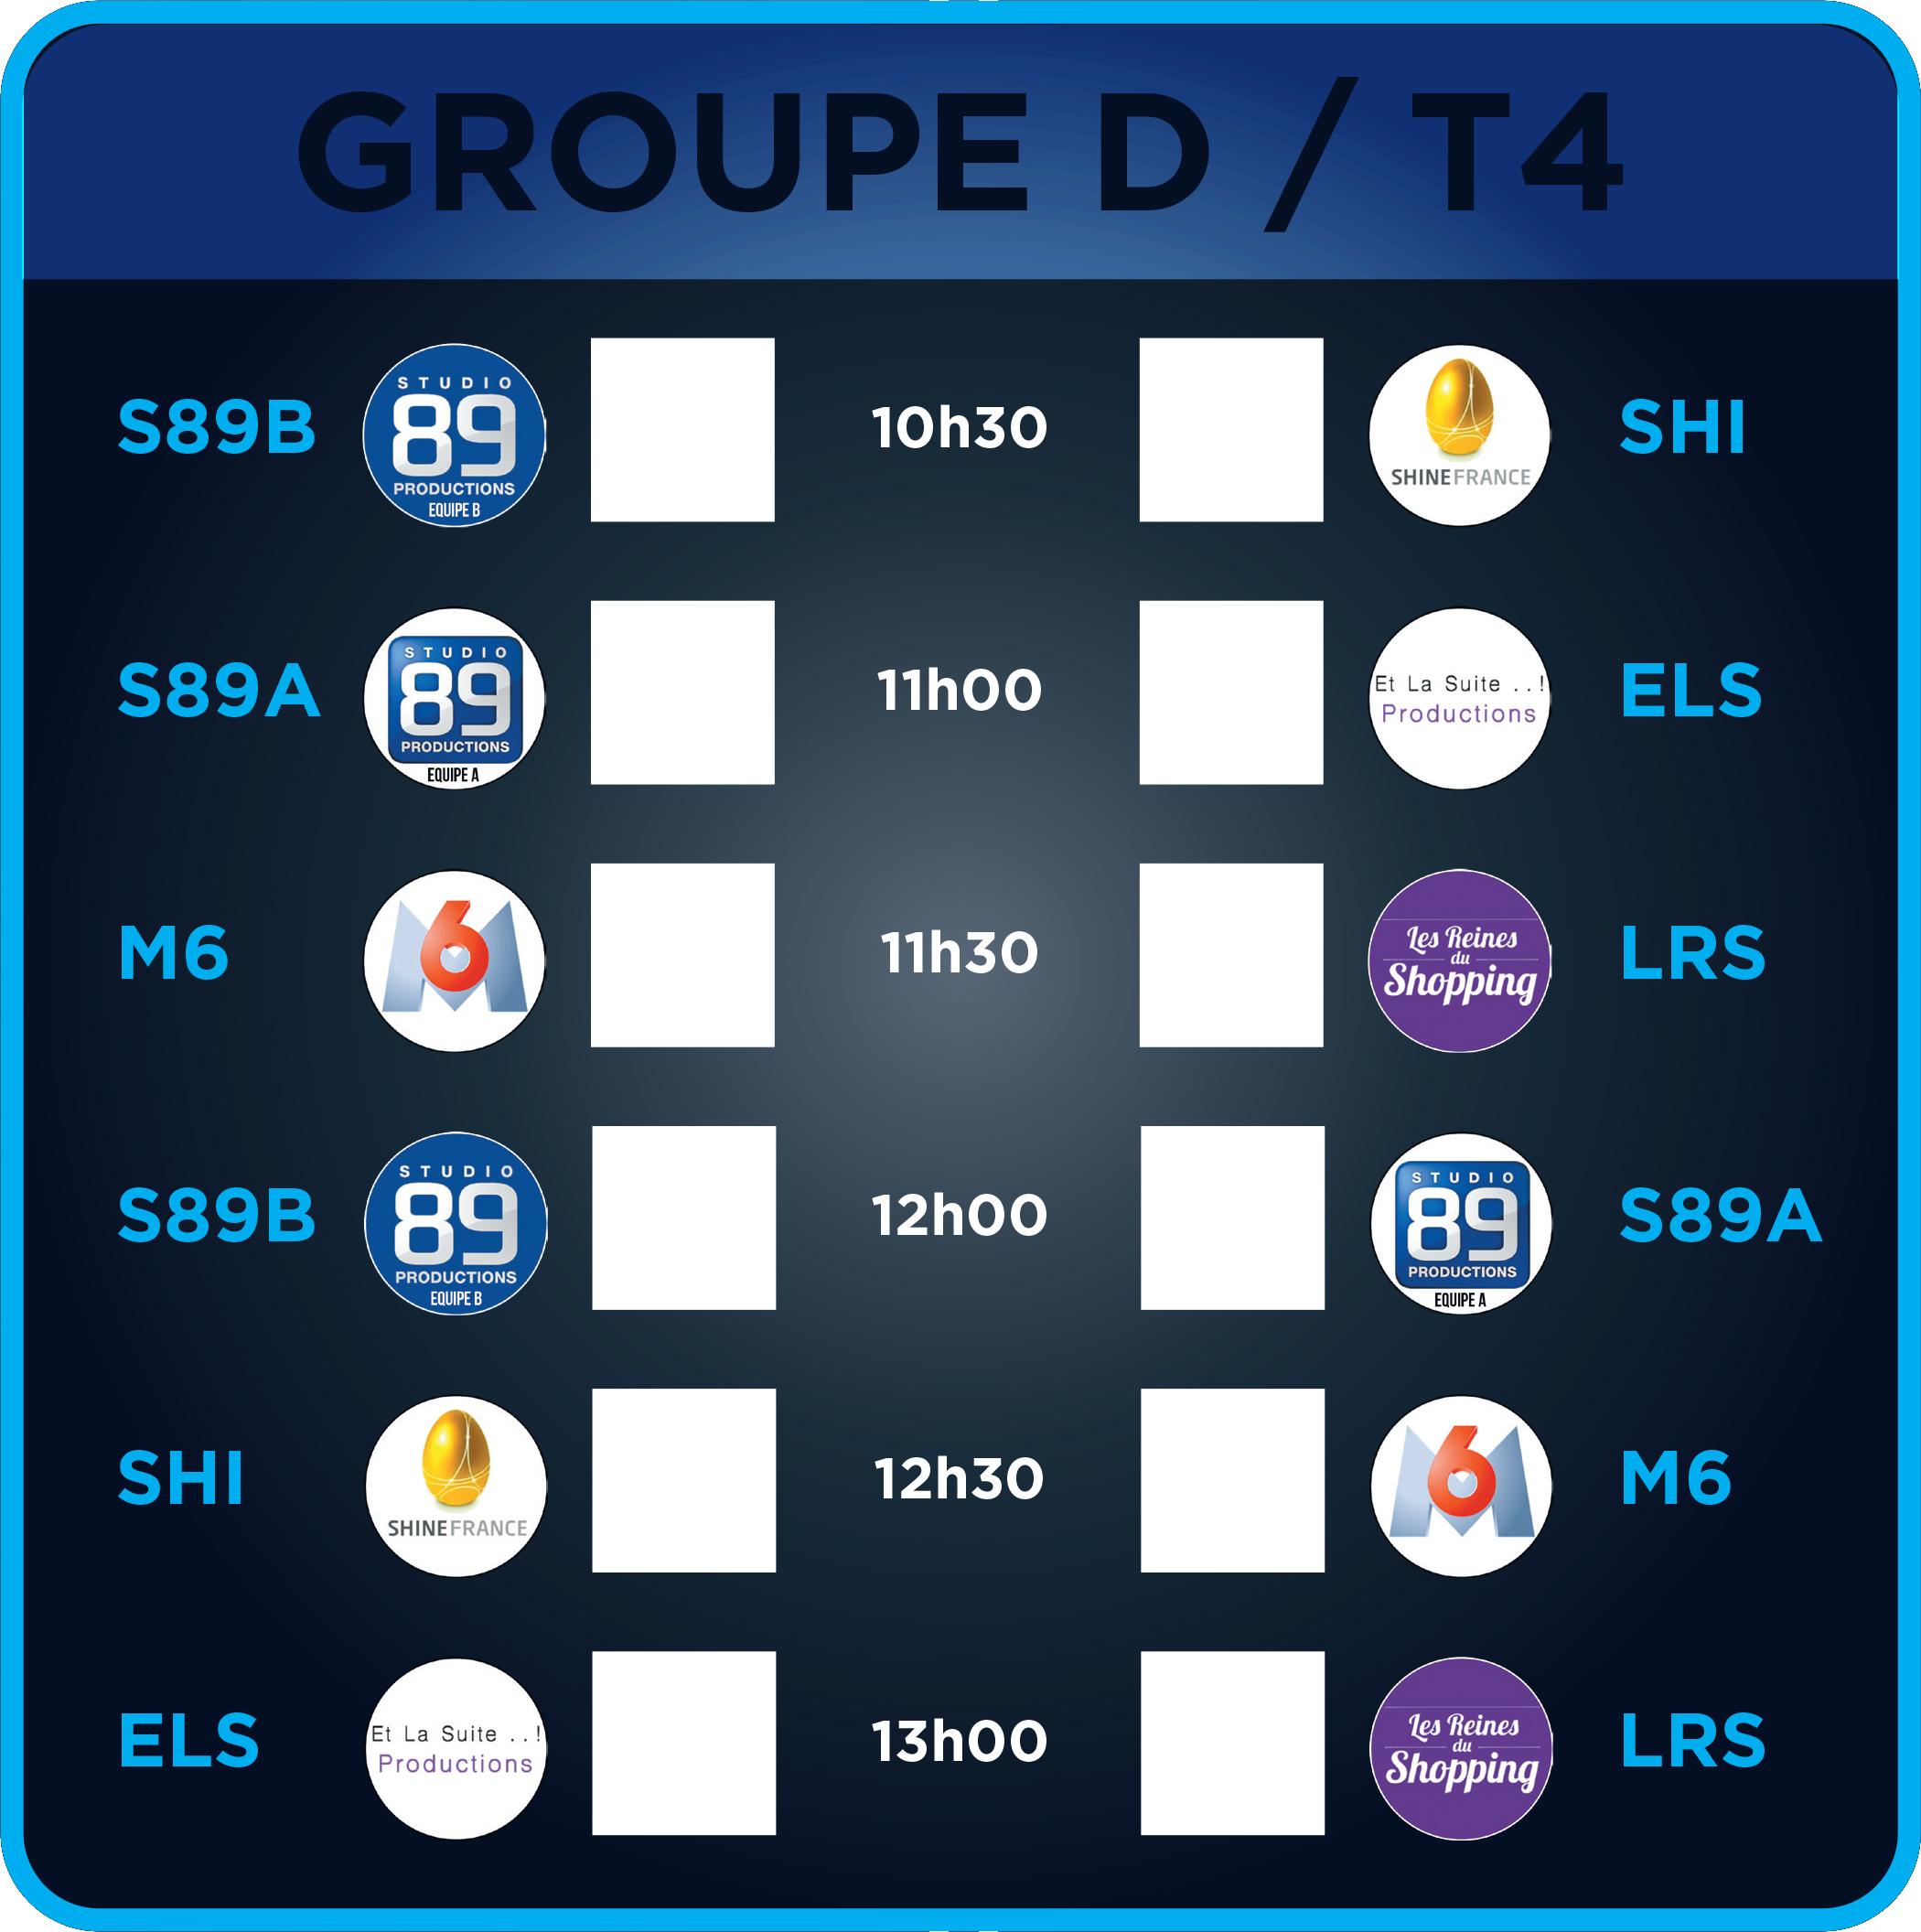 Groupe D - Terrain 4